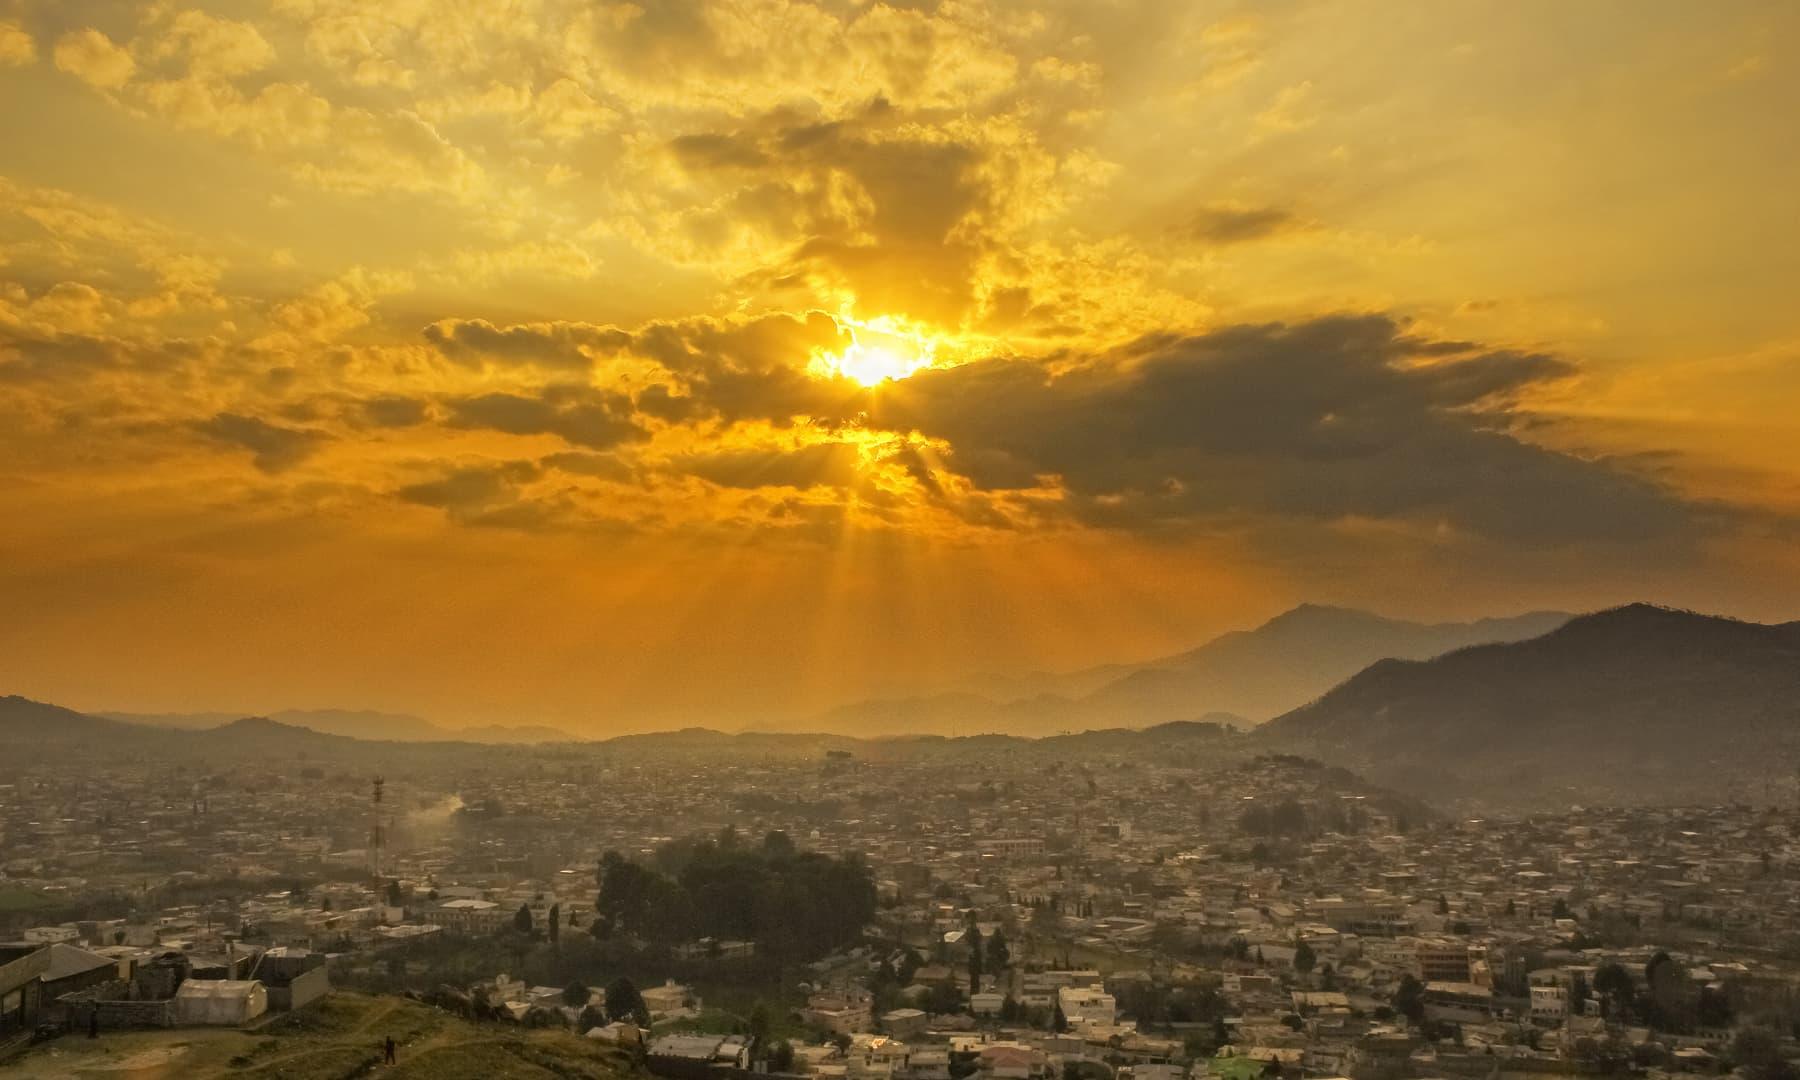 Sunrise at Abbottabad.